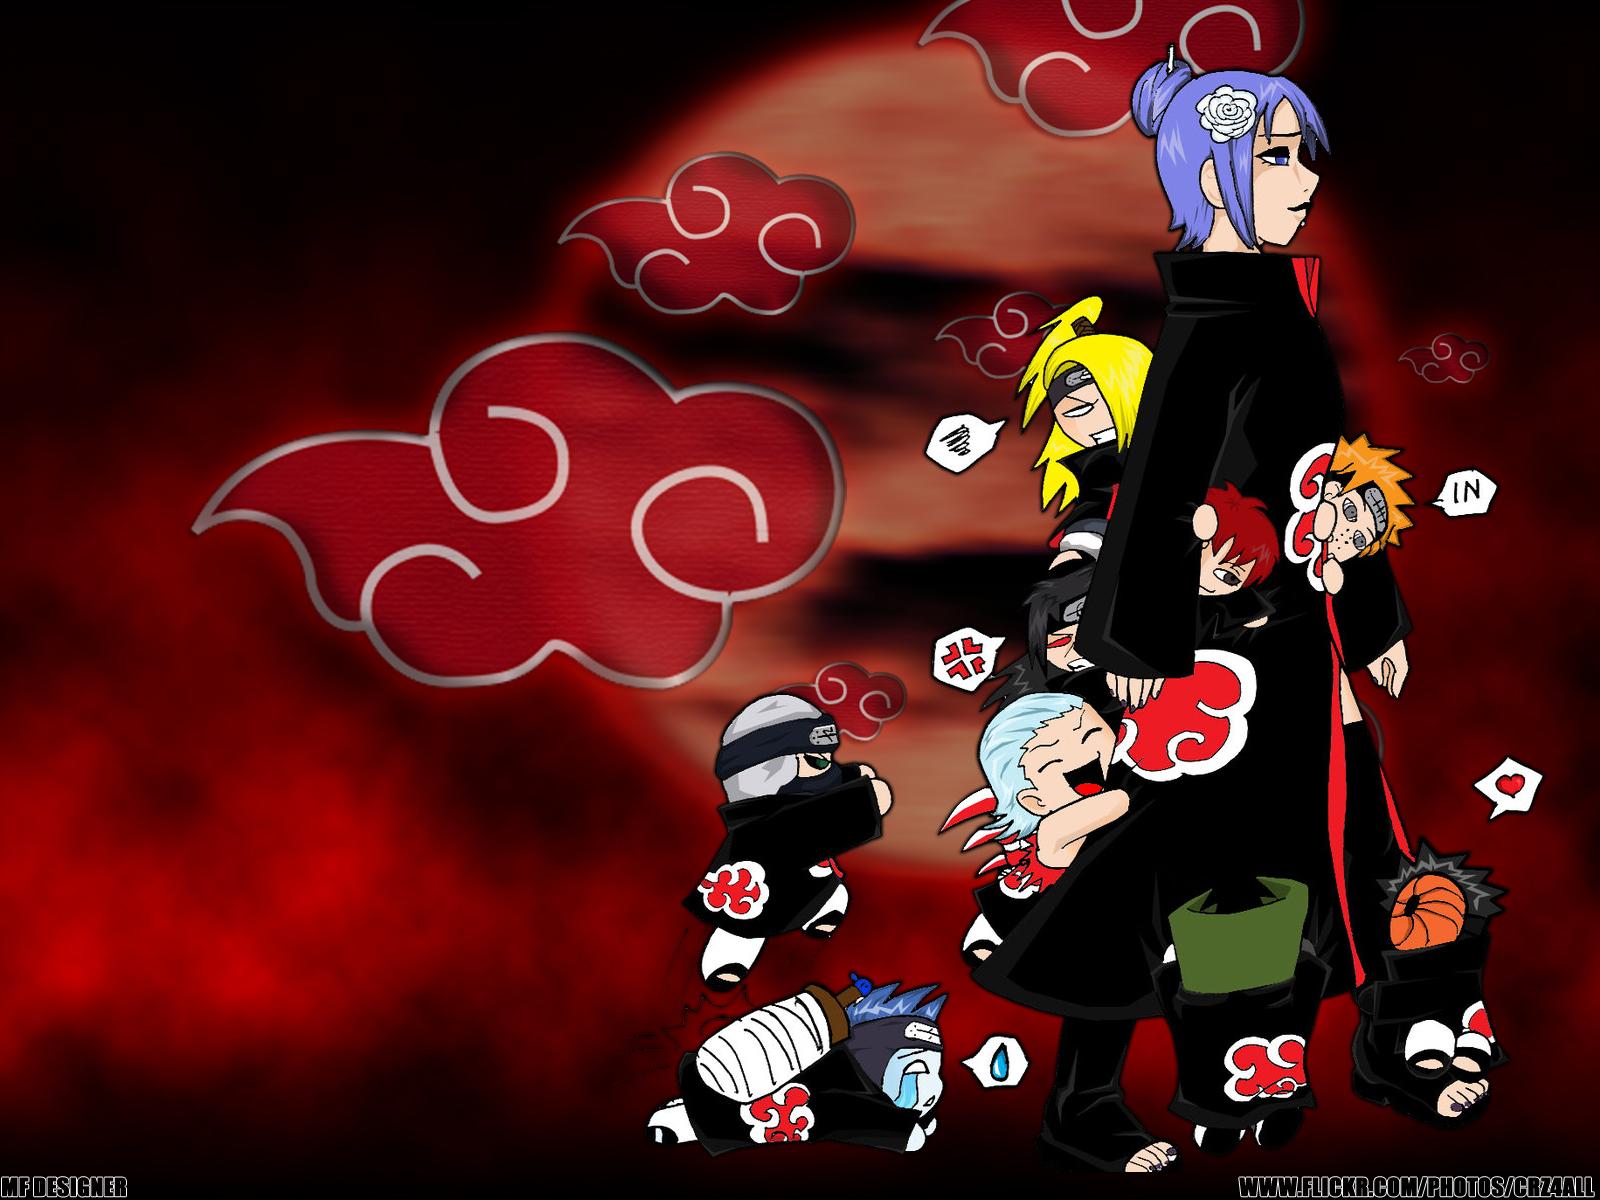 http://4.bp.blogspot.com/-HhH1_tZoKdA/TttD44OaEMI/AAAAAAAAI68/IFquStwCrJA/s1600/Wallpaper+Naruto+-+19.jpg